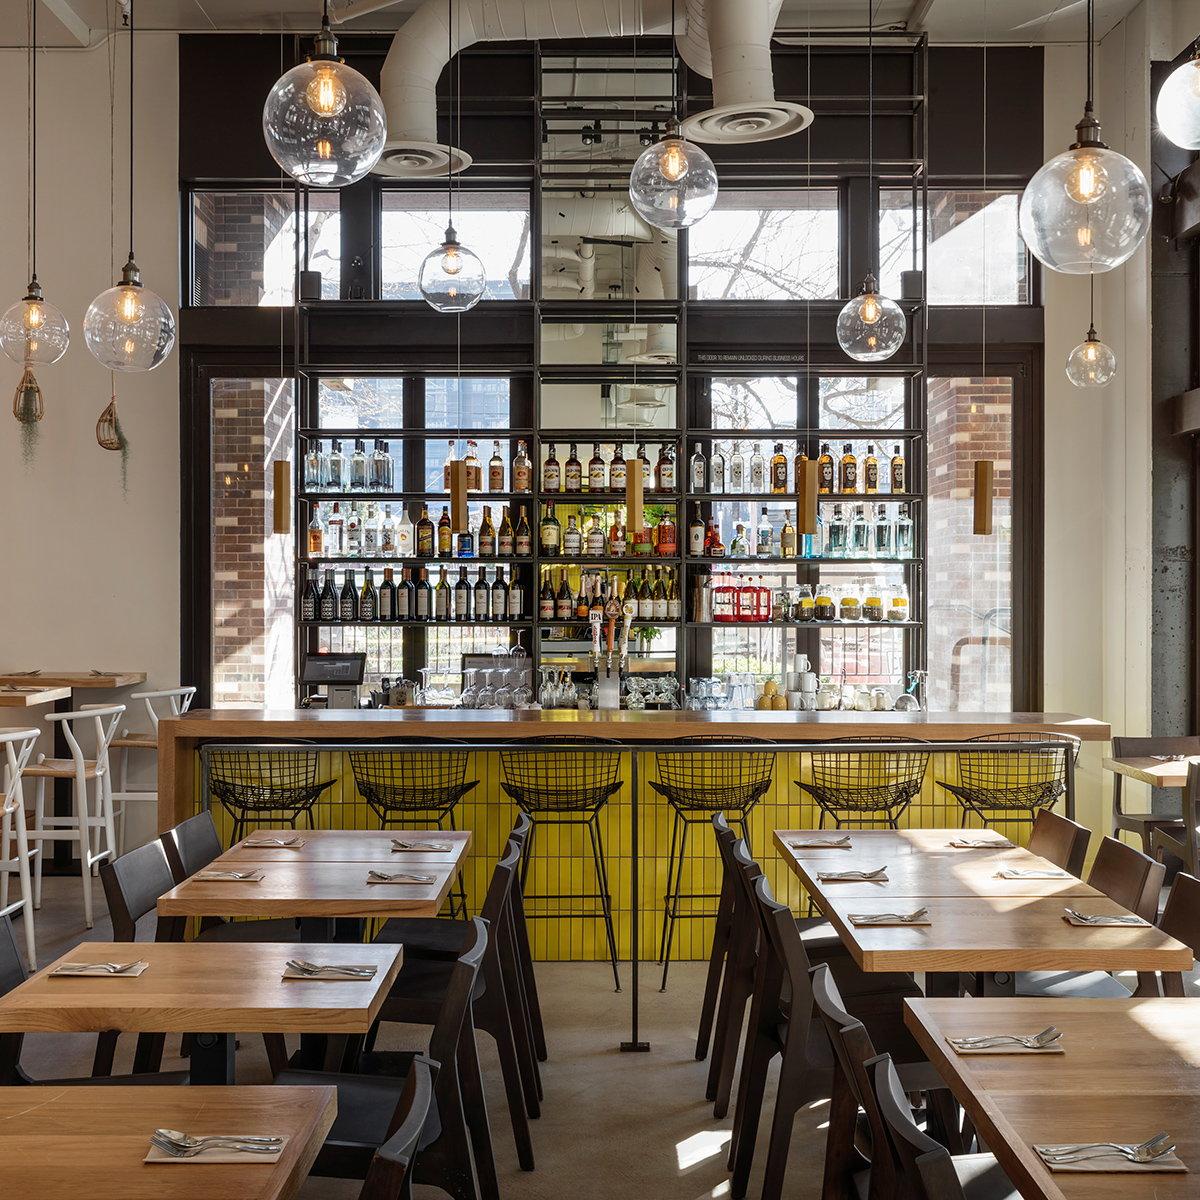 Interior design news - Restaurant interior design seattle ...